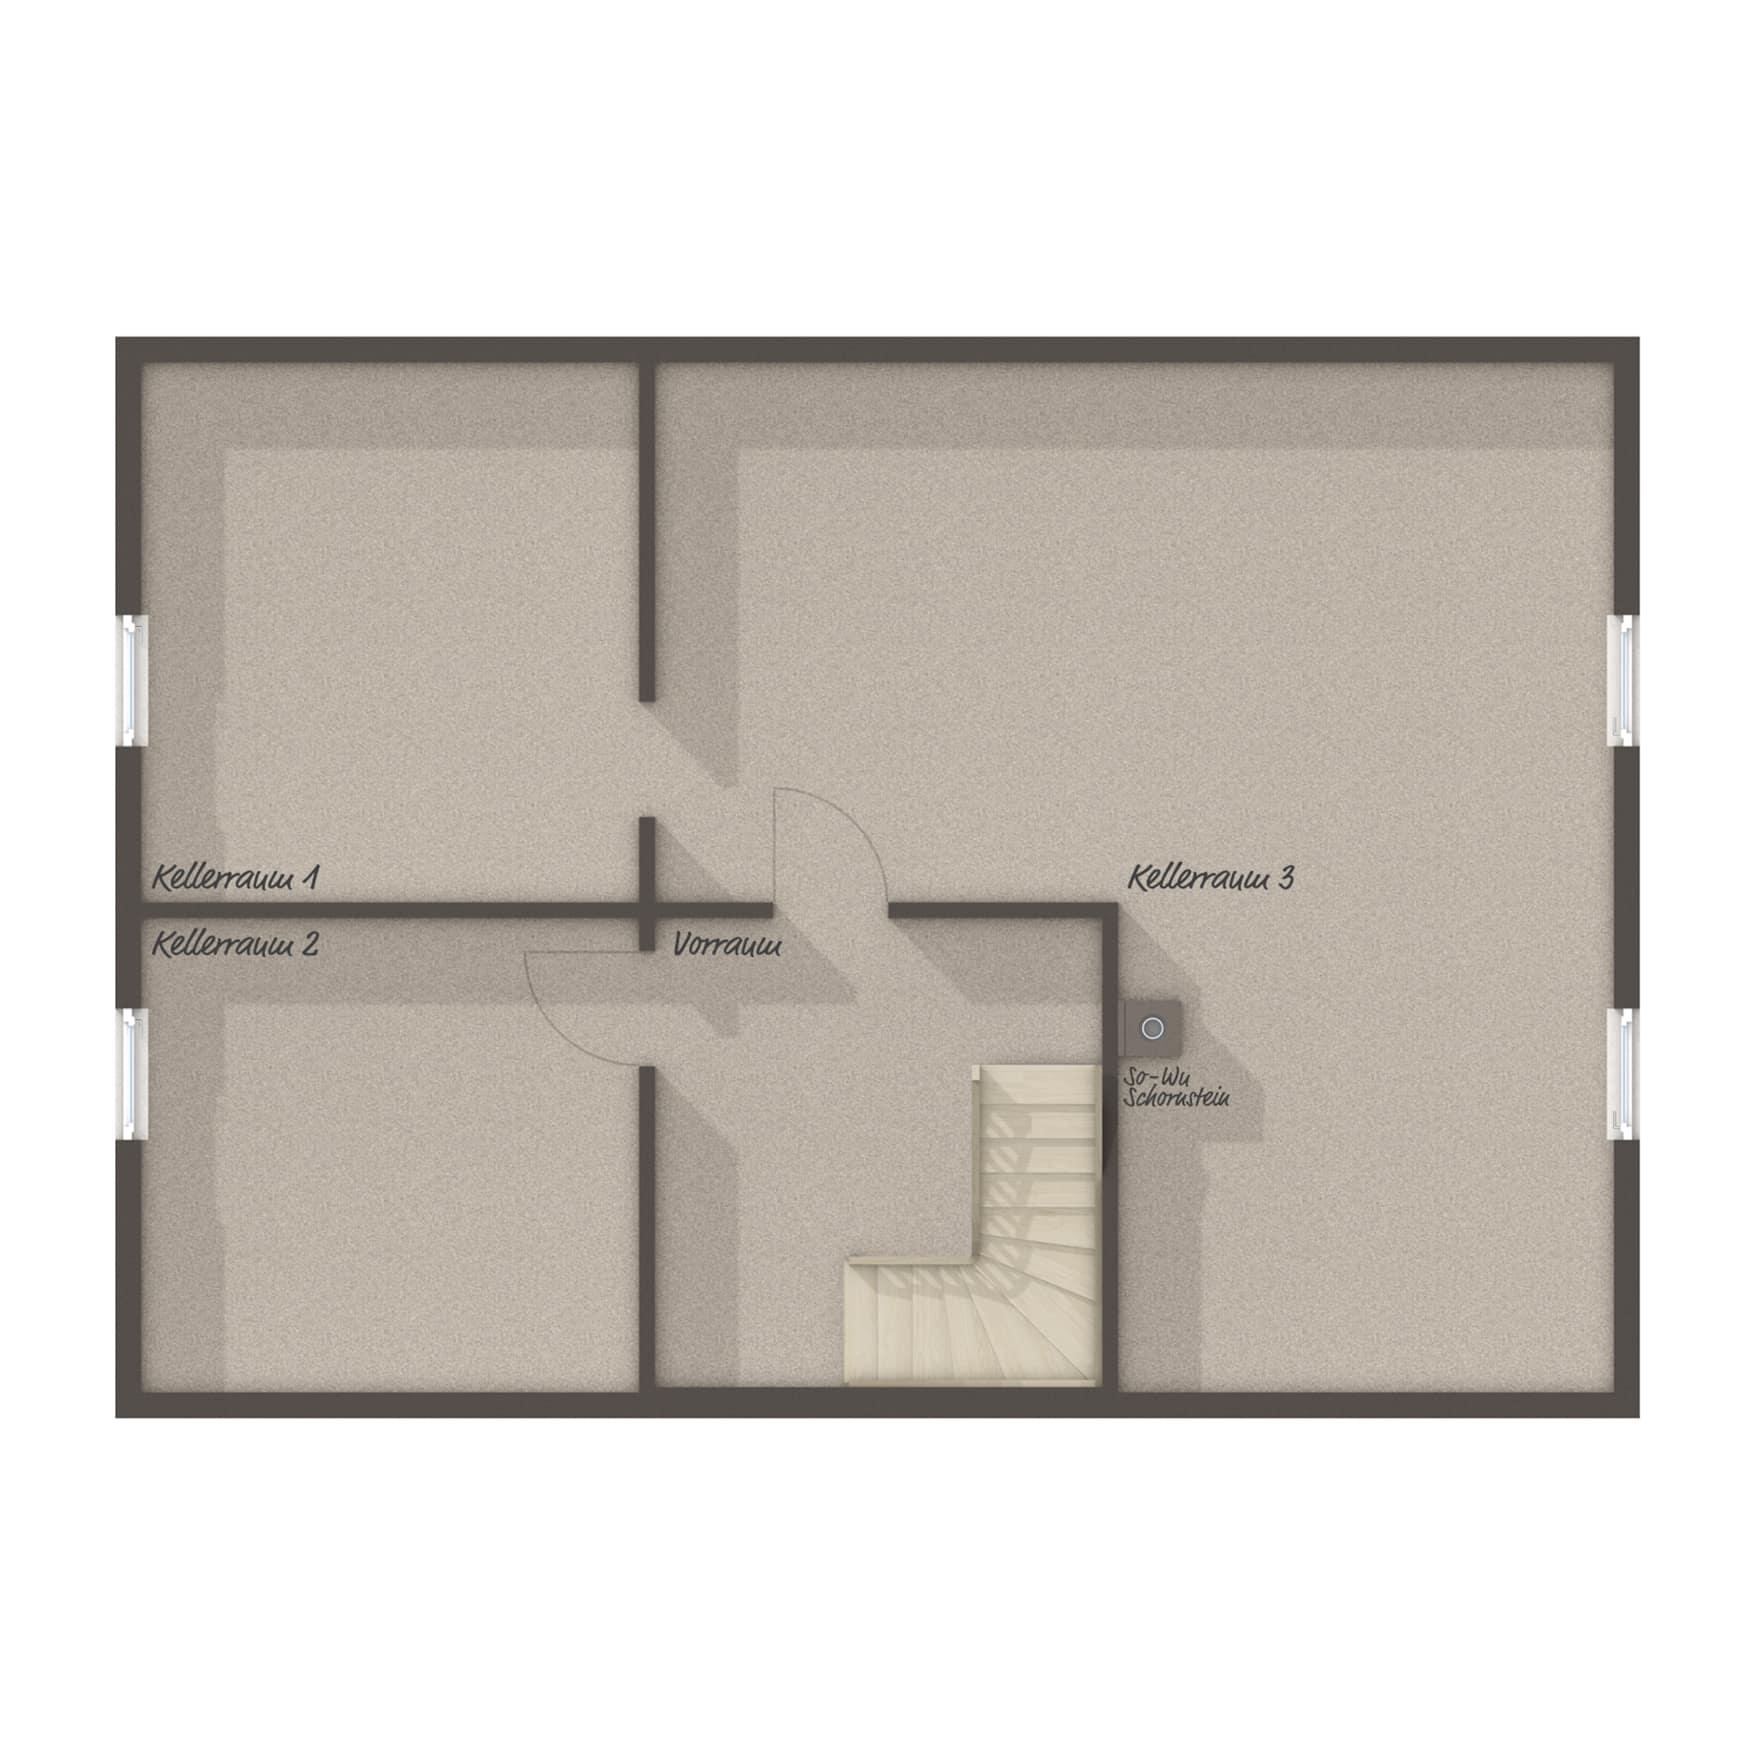 Grundriss Einfamilienhaus Keller - Town Country Haus Massivhaus Landhaus 142 - HausbauDirekt.de